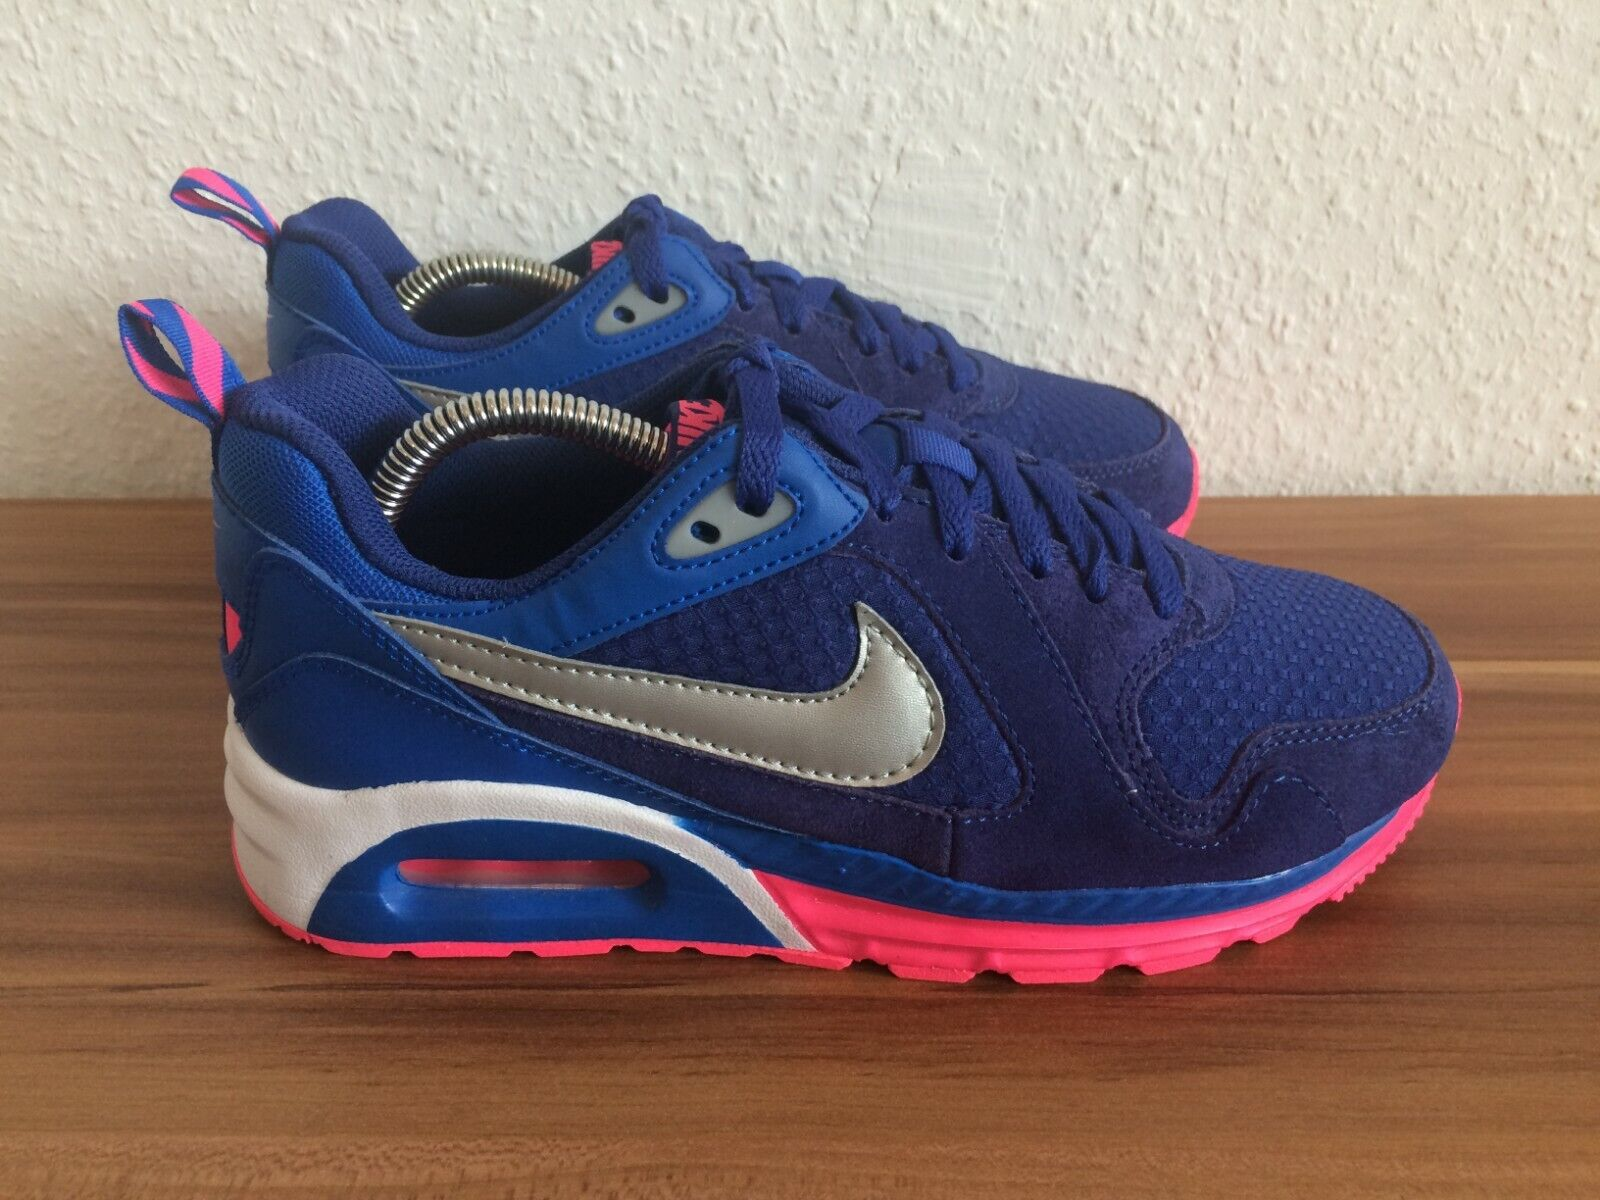 Super Nike Air Max Trax Damen Turnschuhe Schuhe Sportschuhe Gr. 38,5   UK 5,5 Top